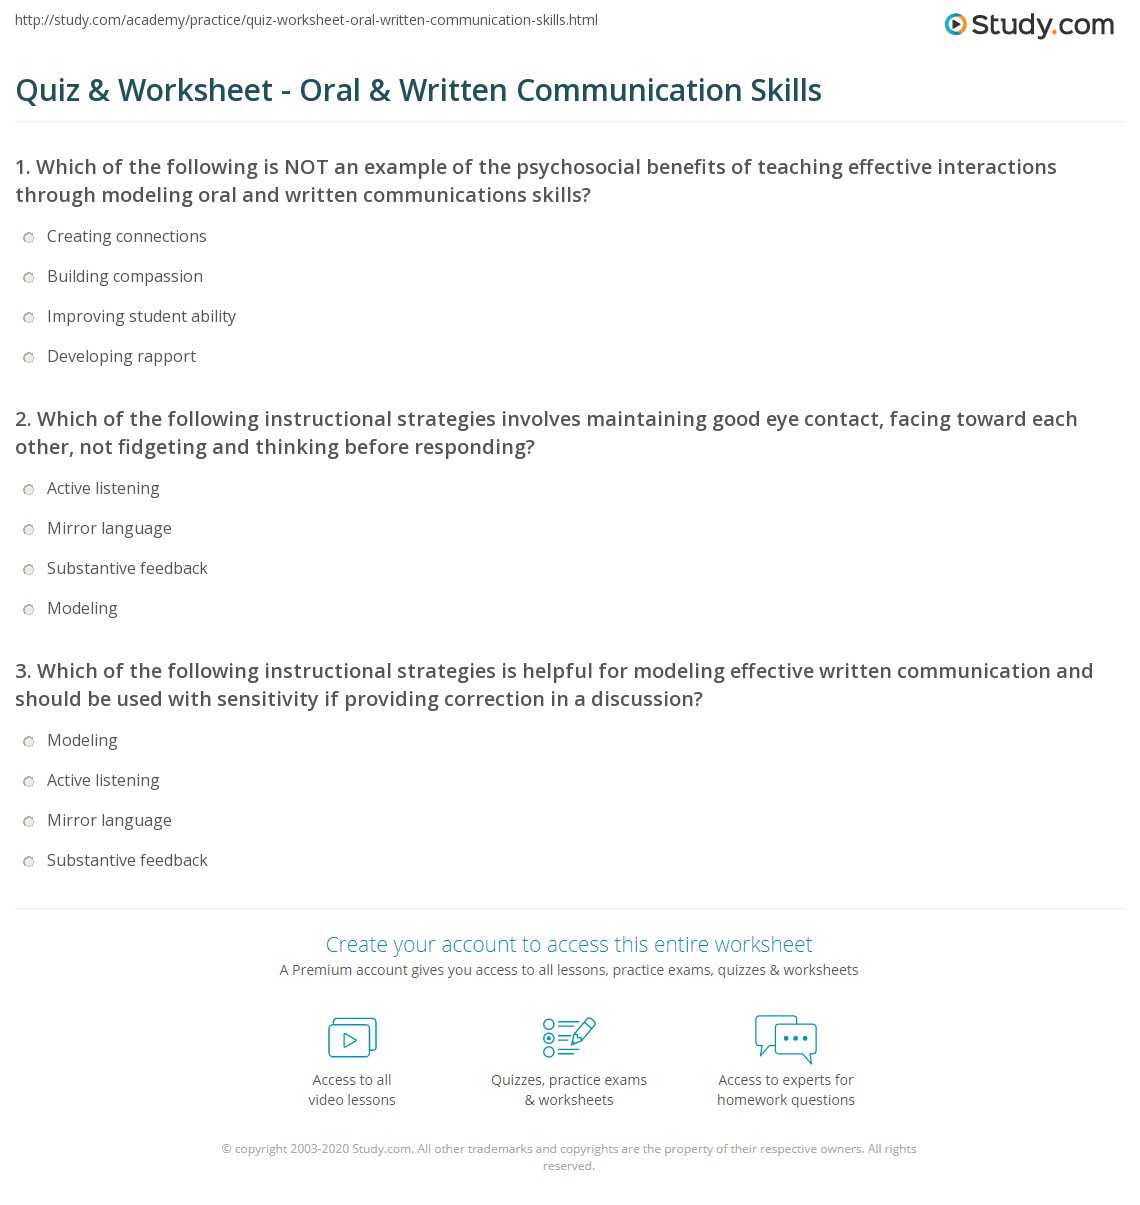 Quiz Worksheet Oral Written Communication Skills Study